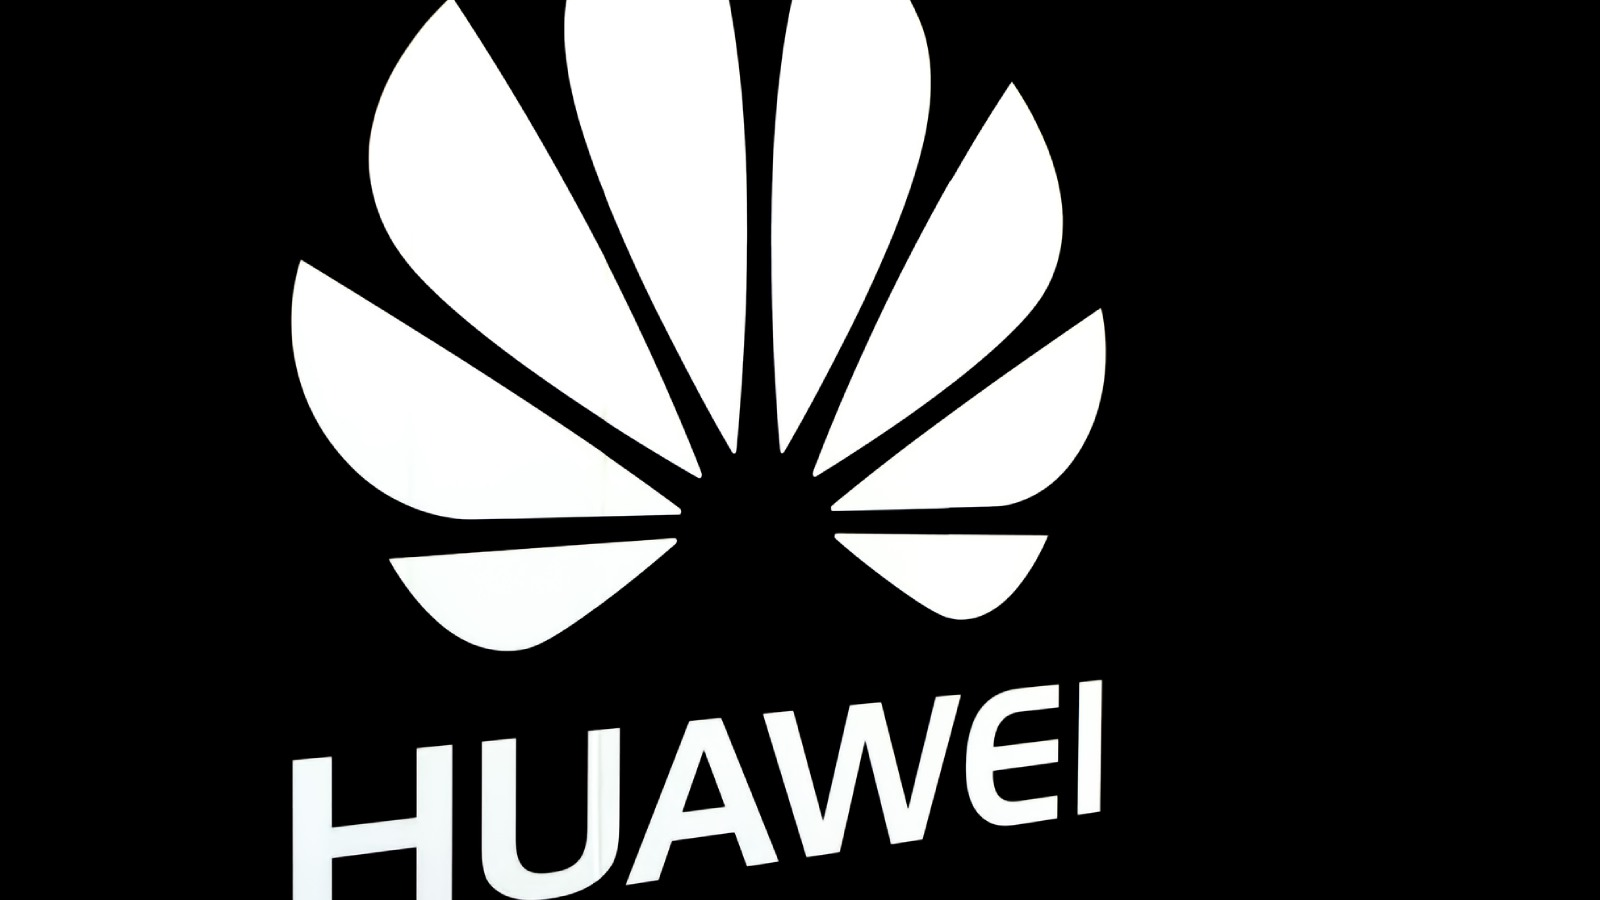 Huawei Brand Logo